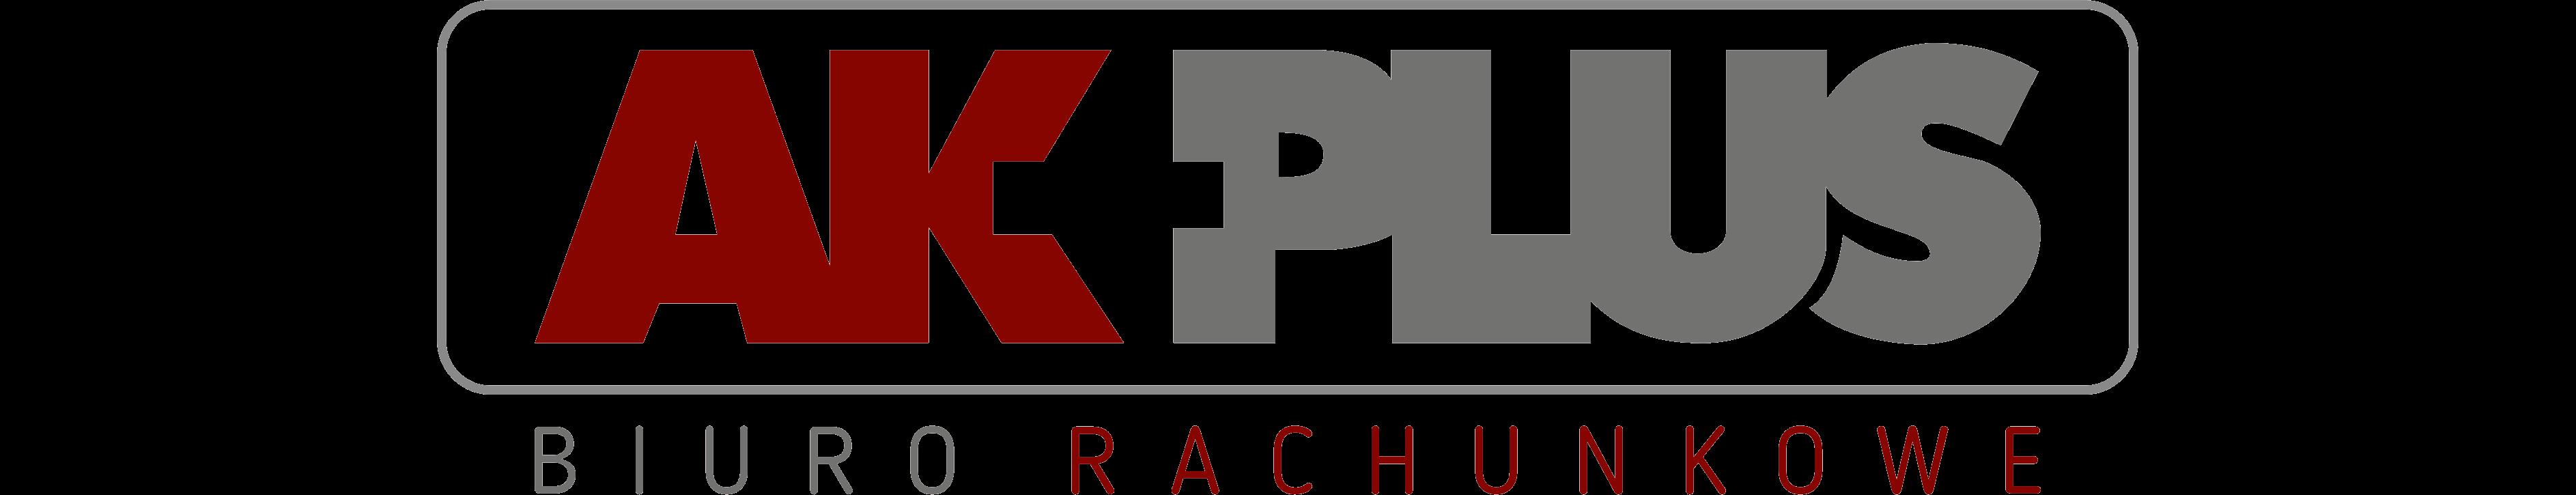 Biuro rachunkowe AK-PLUS logotyp